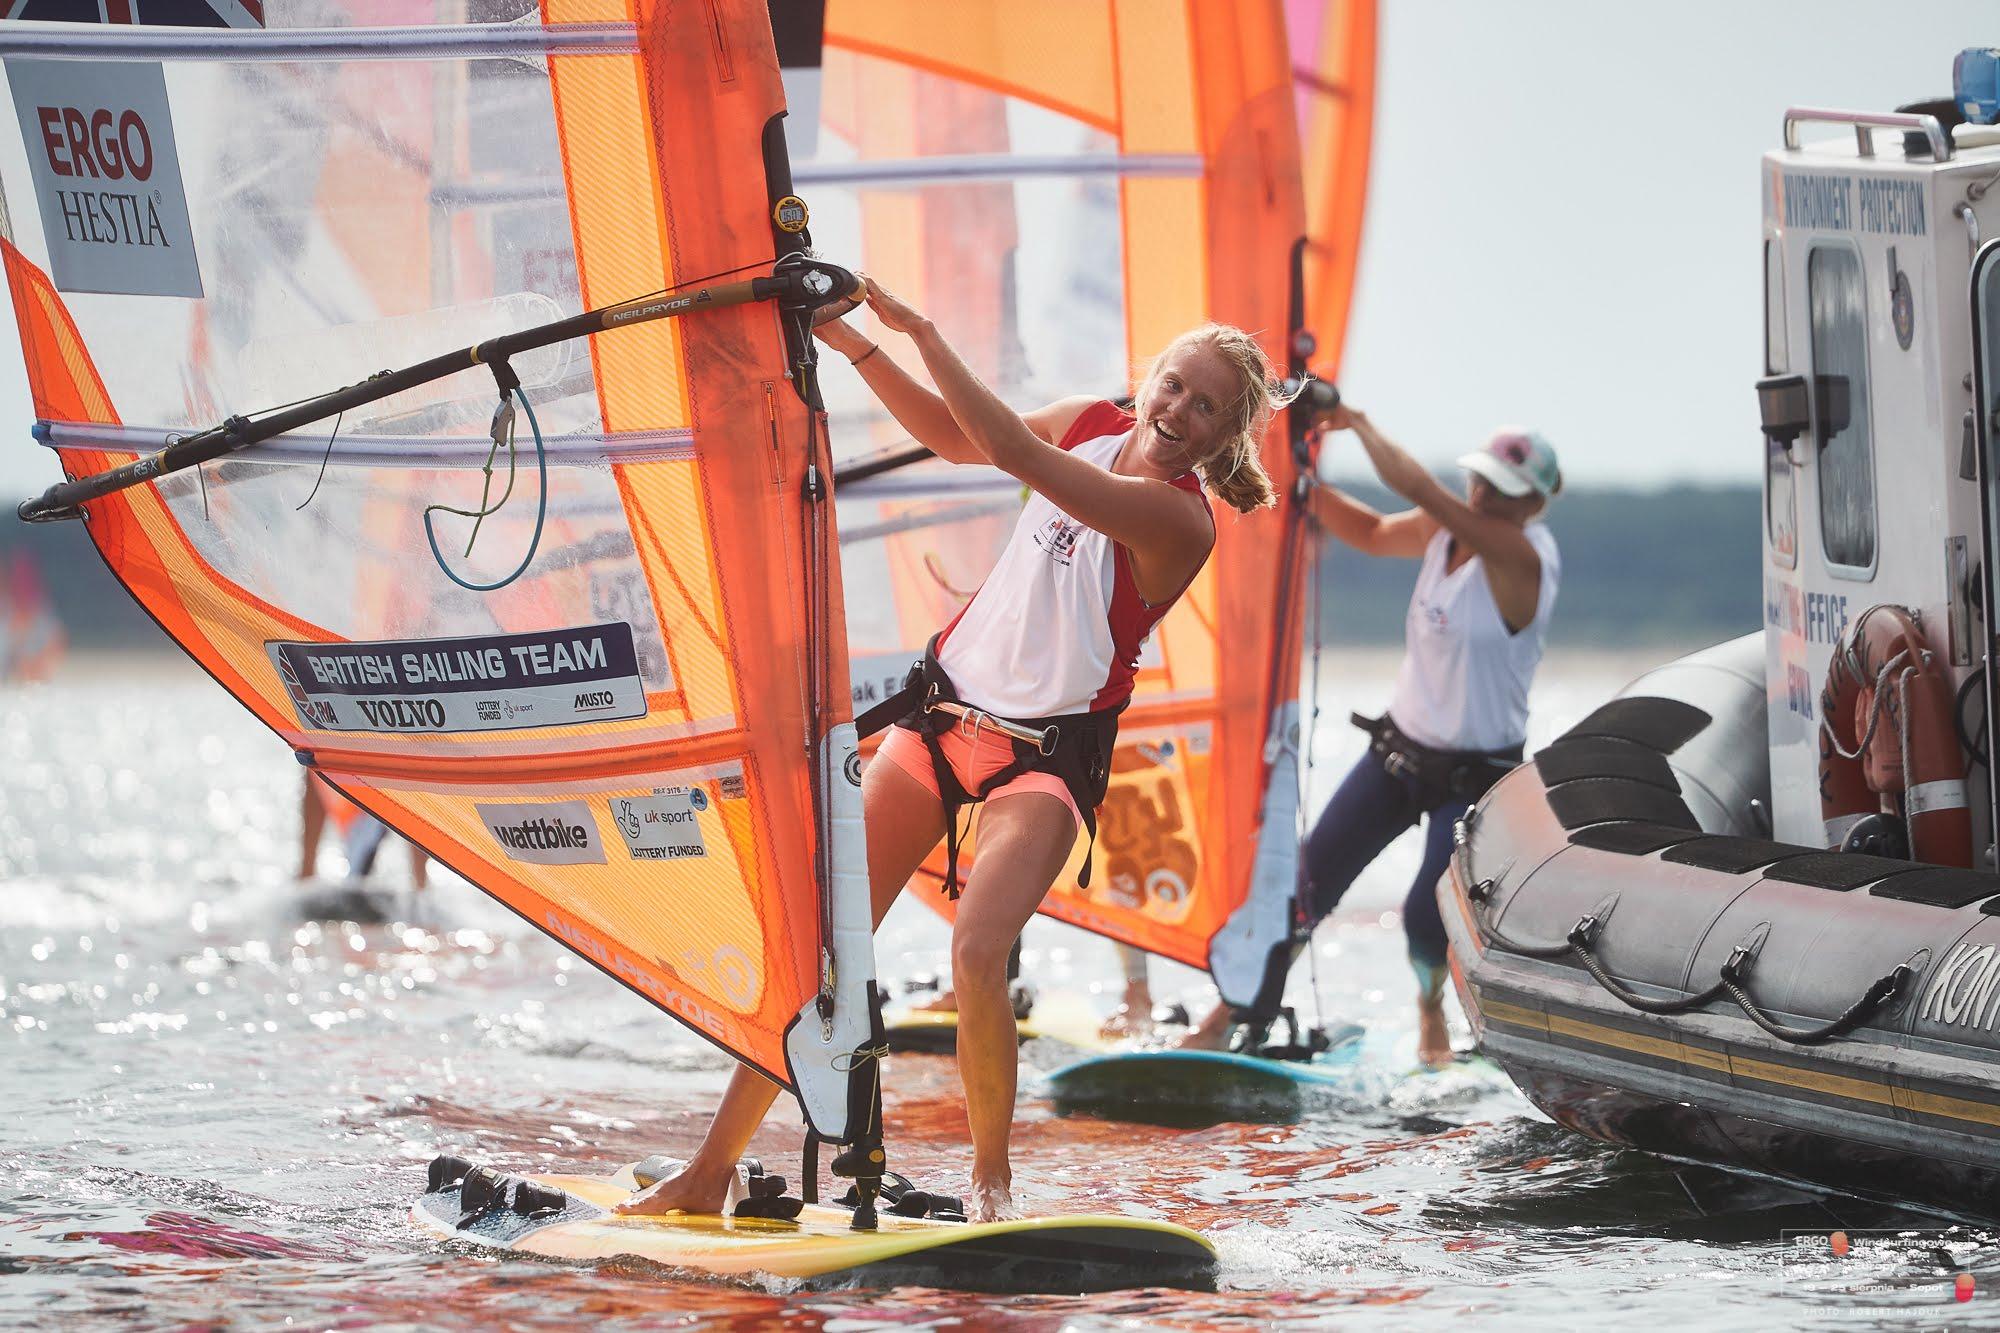 Olympic Sailing: British windsurfer Emma Wilson claims first world championship medal